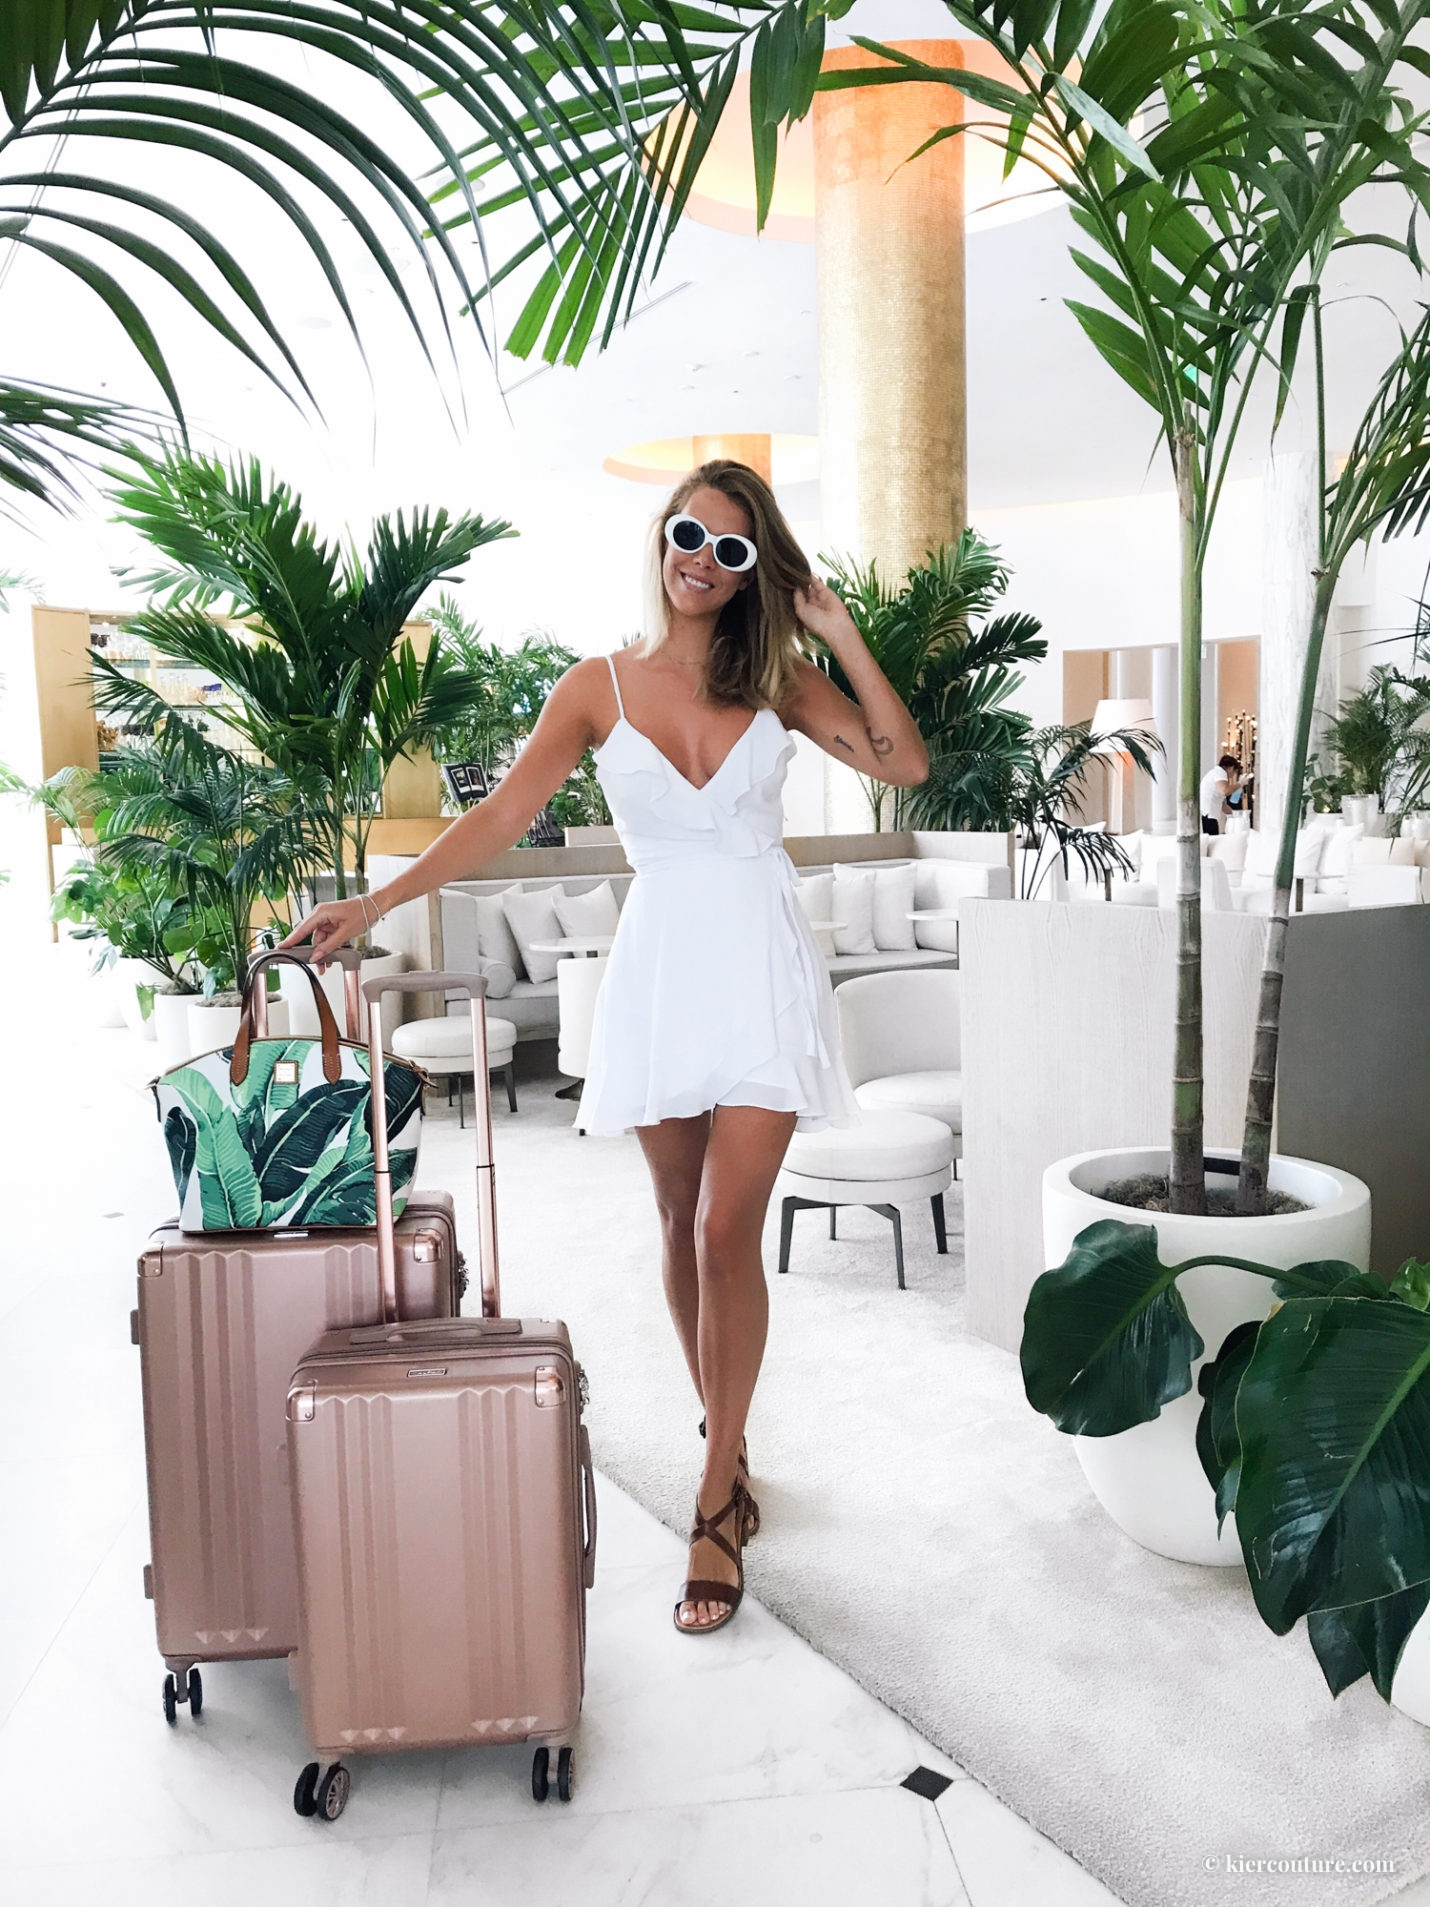 Miami edition hotel review